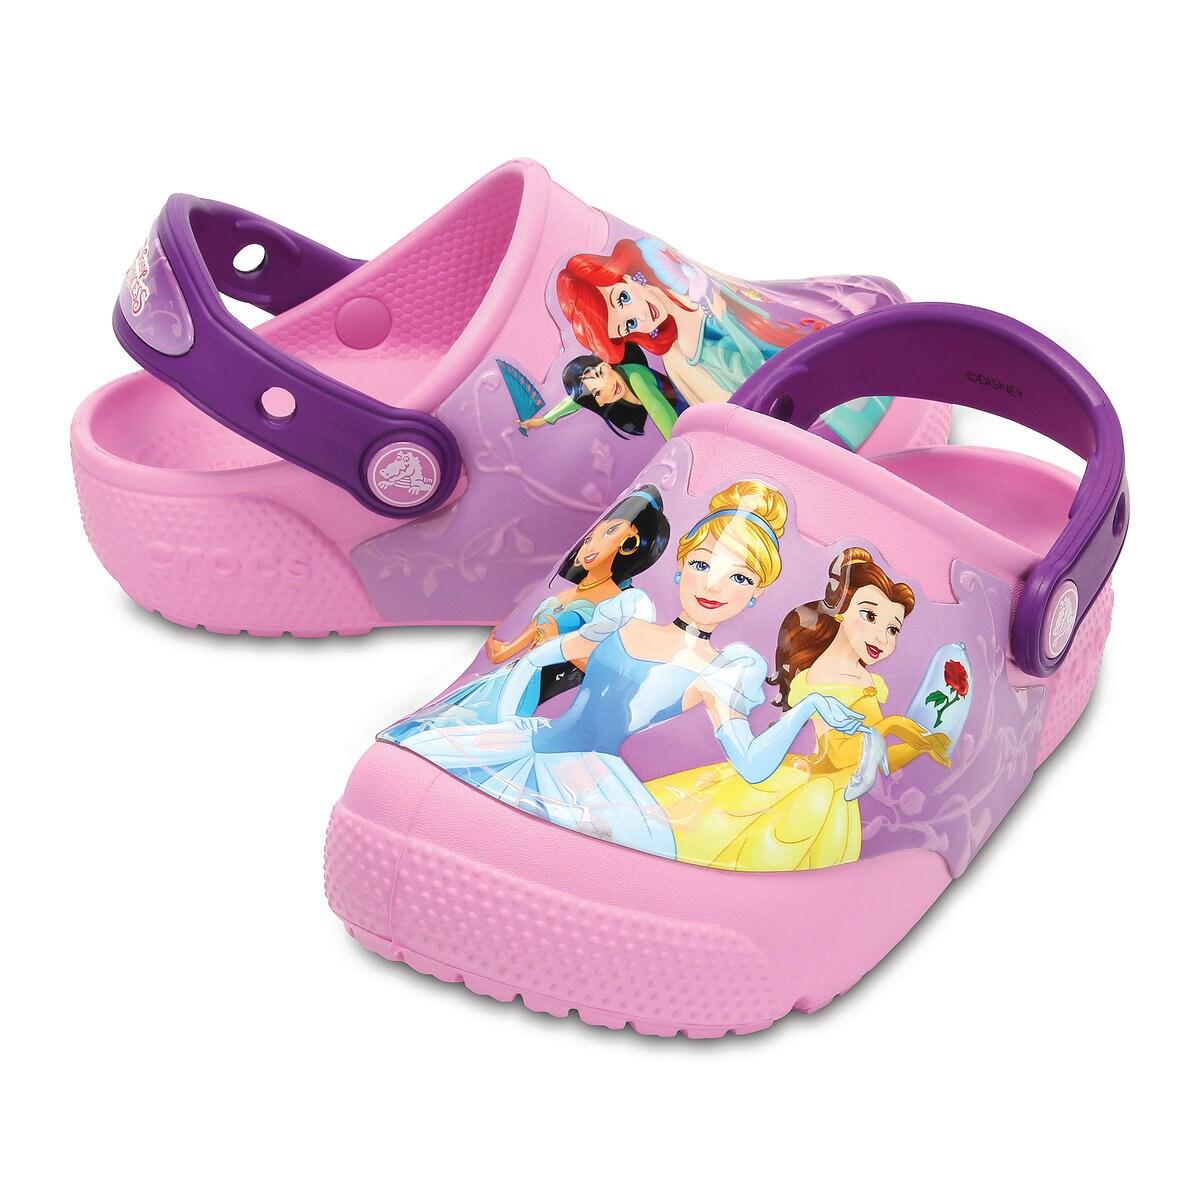 d990062ab8 Disney Princess Light-Up Clogs for Kids by Crocs